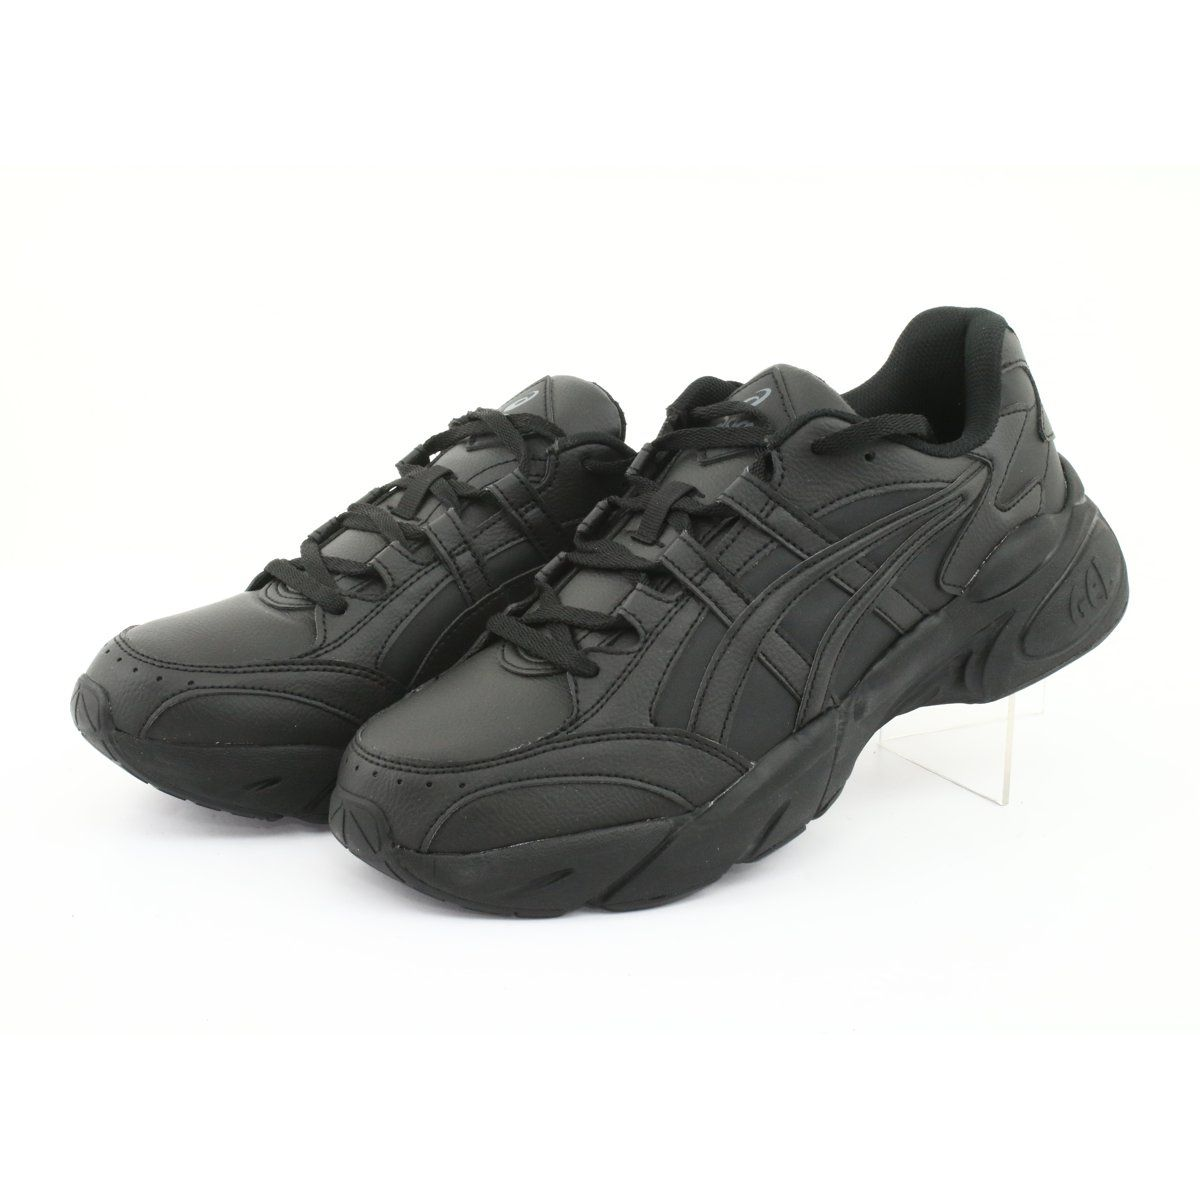 Buty Asics Gel Bnd M 1021a217 001 Czarne Asics Gel Shoes Black Shoes Asics Gel